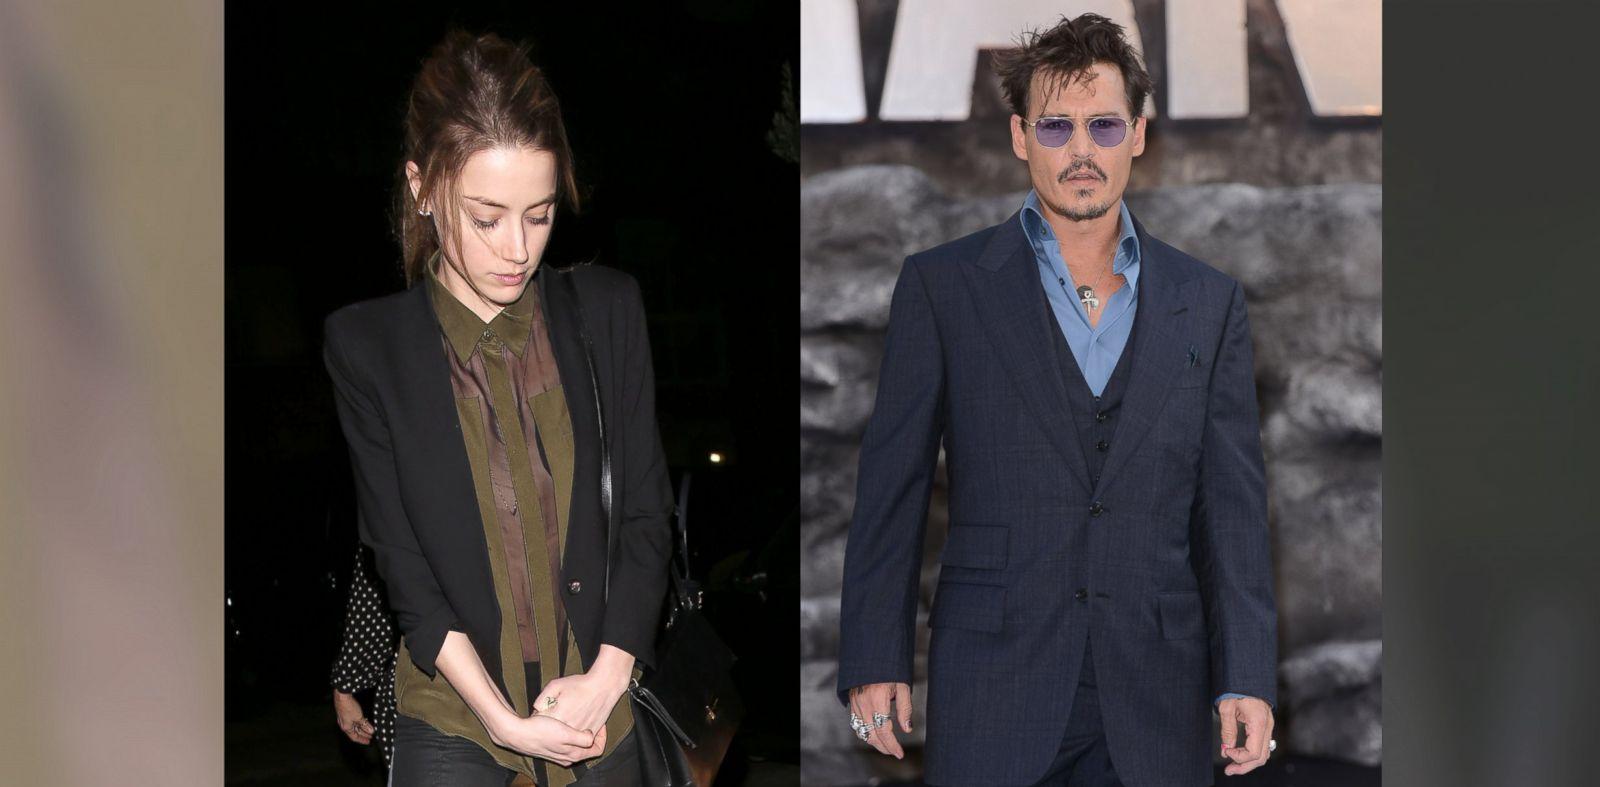 PHOTO: Johnny Depps (R) girlfriend, Amber Heard (L) seen leaving AGO Italian Restaurant in West Hollywood, CA.